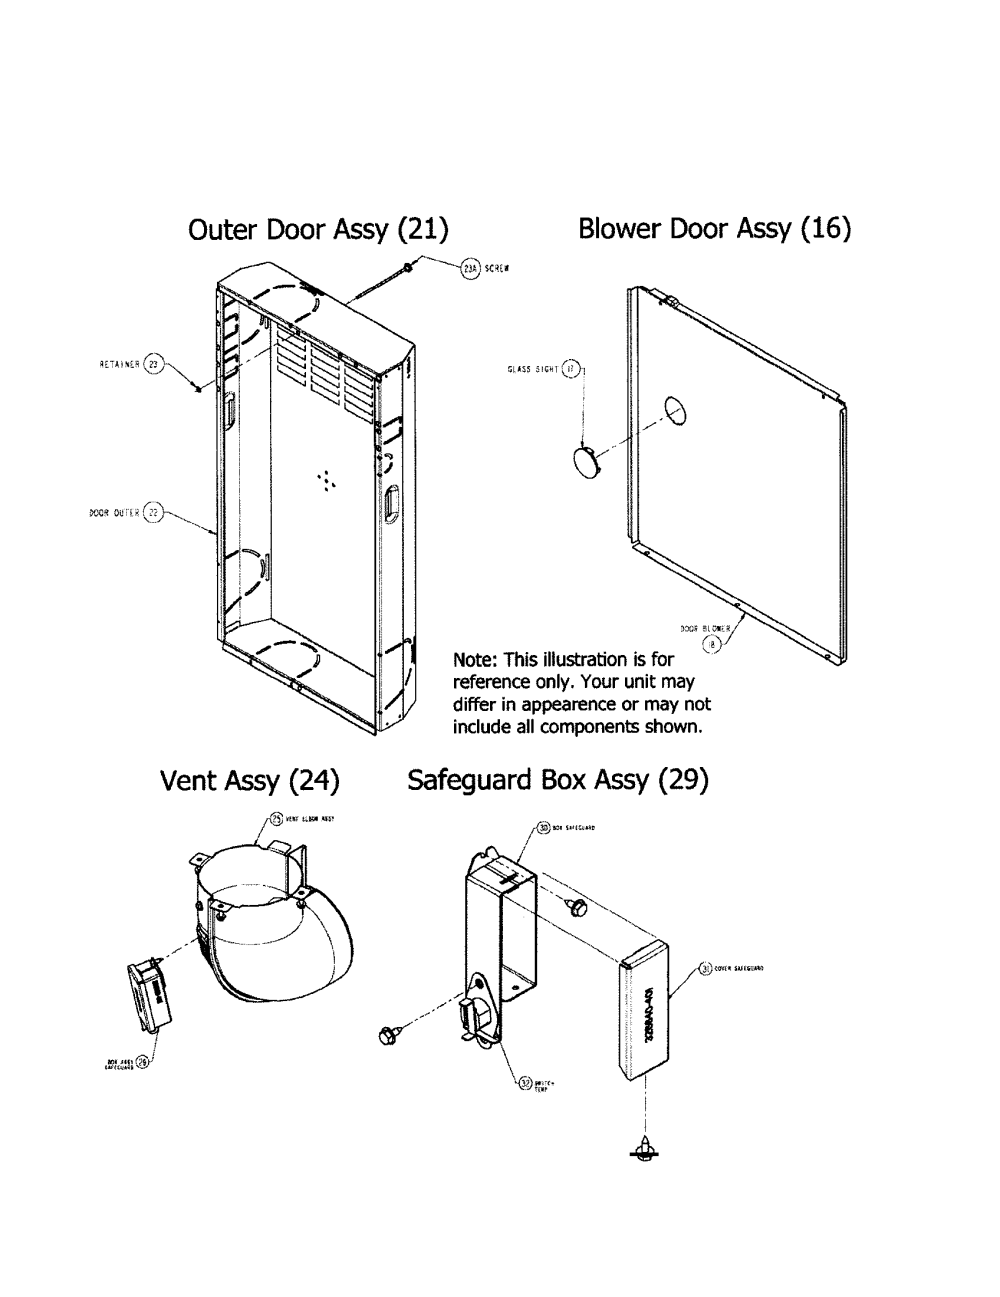 medium resolution of haier heat pump wiring diagram haier image wiring haier washer diagram all about repair and wiring